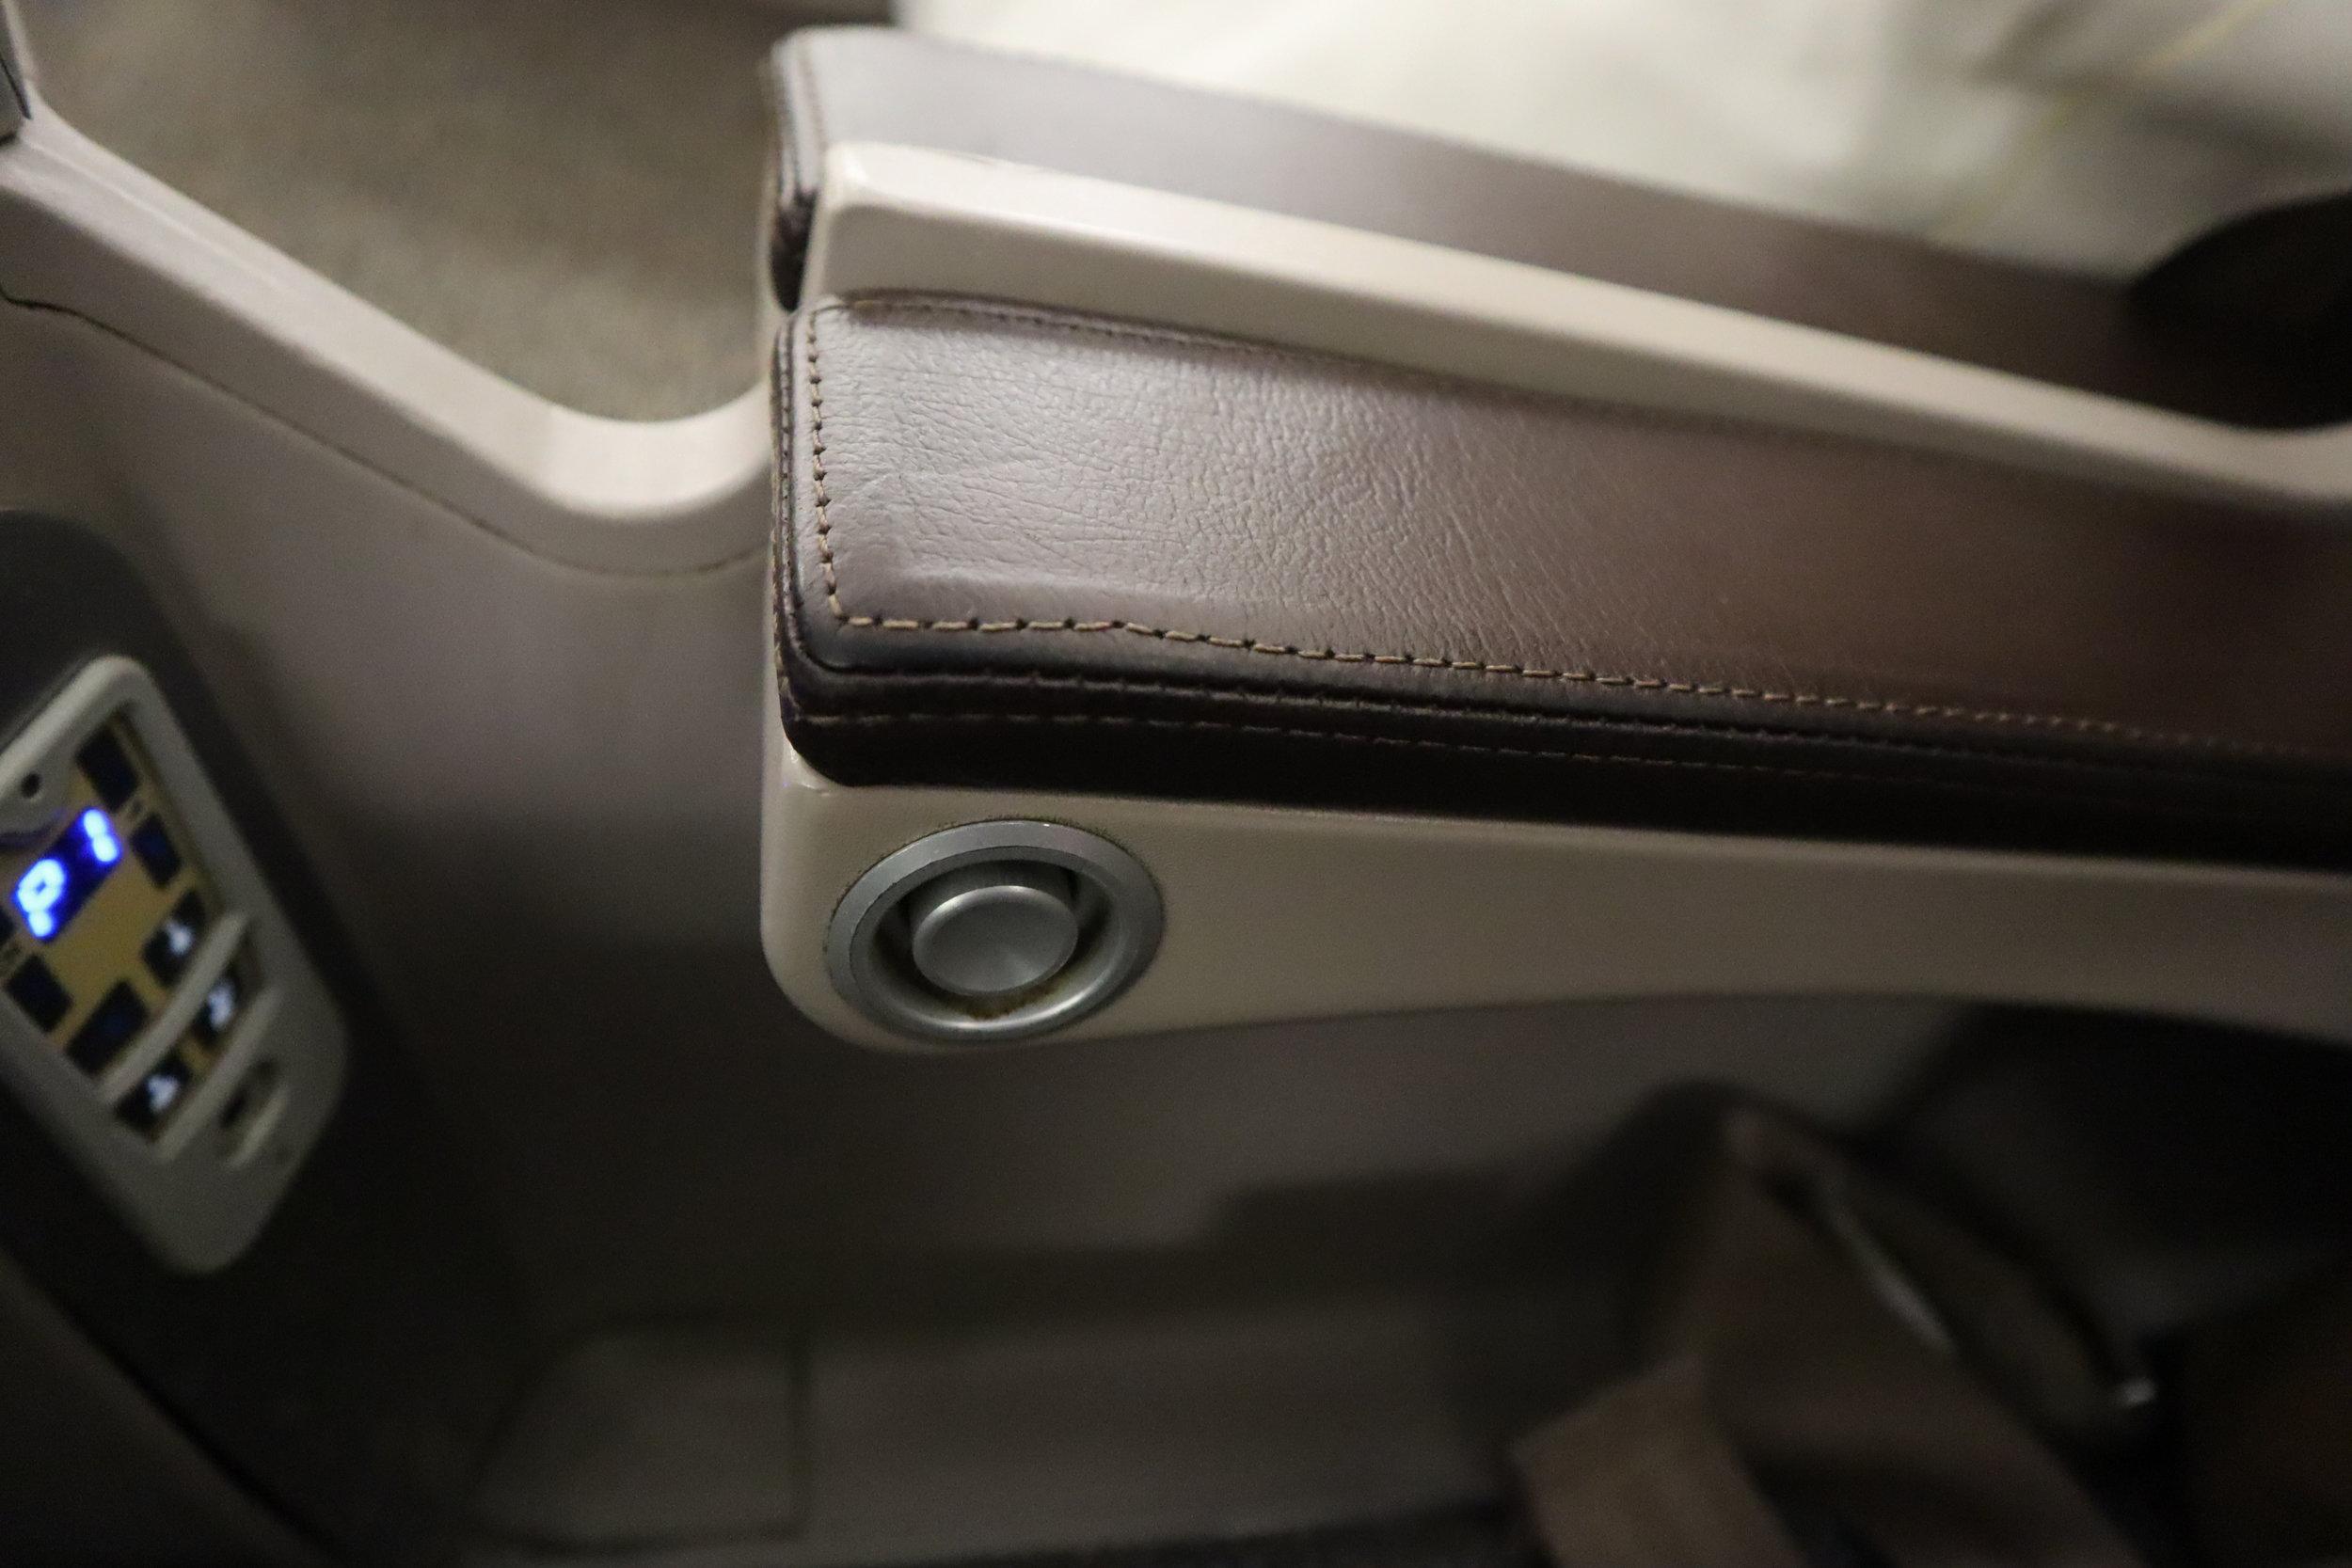 South African Airways business class – Armrest